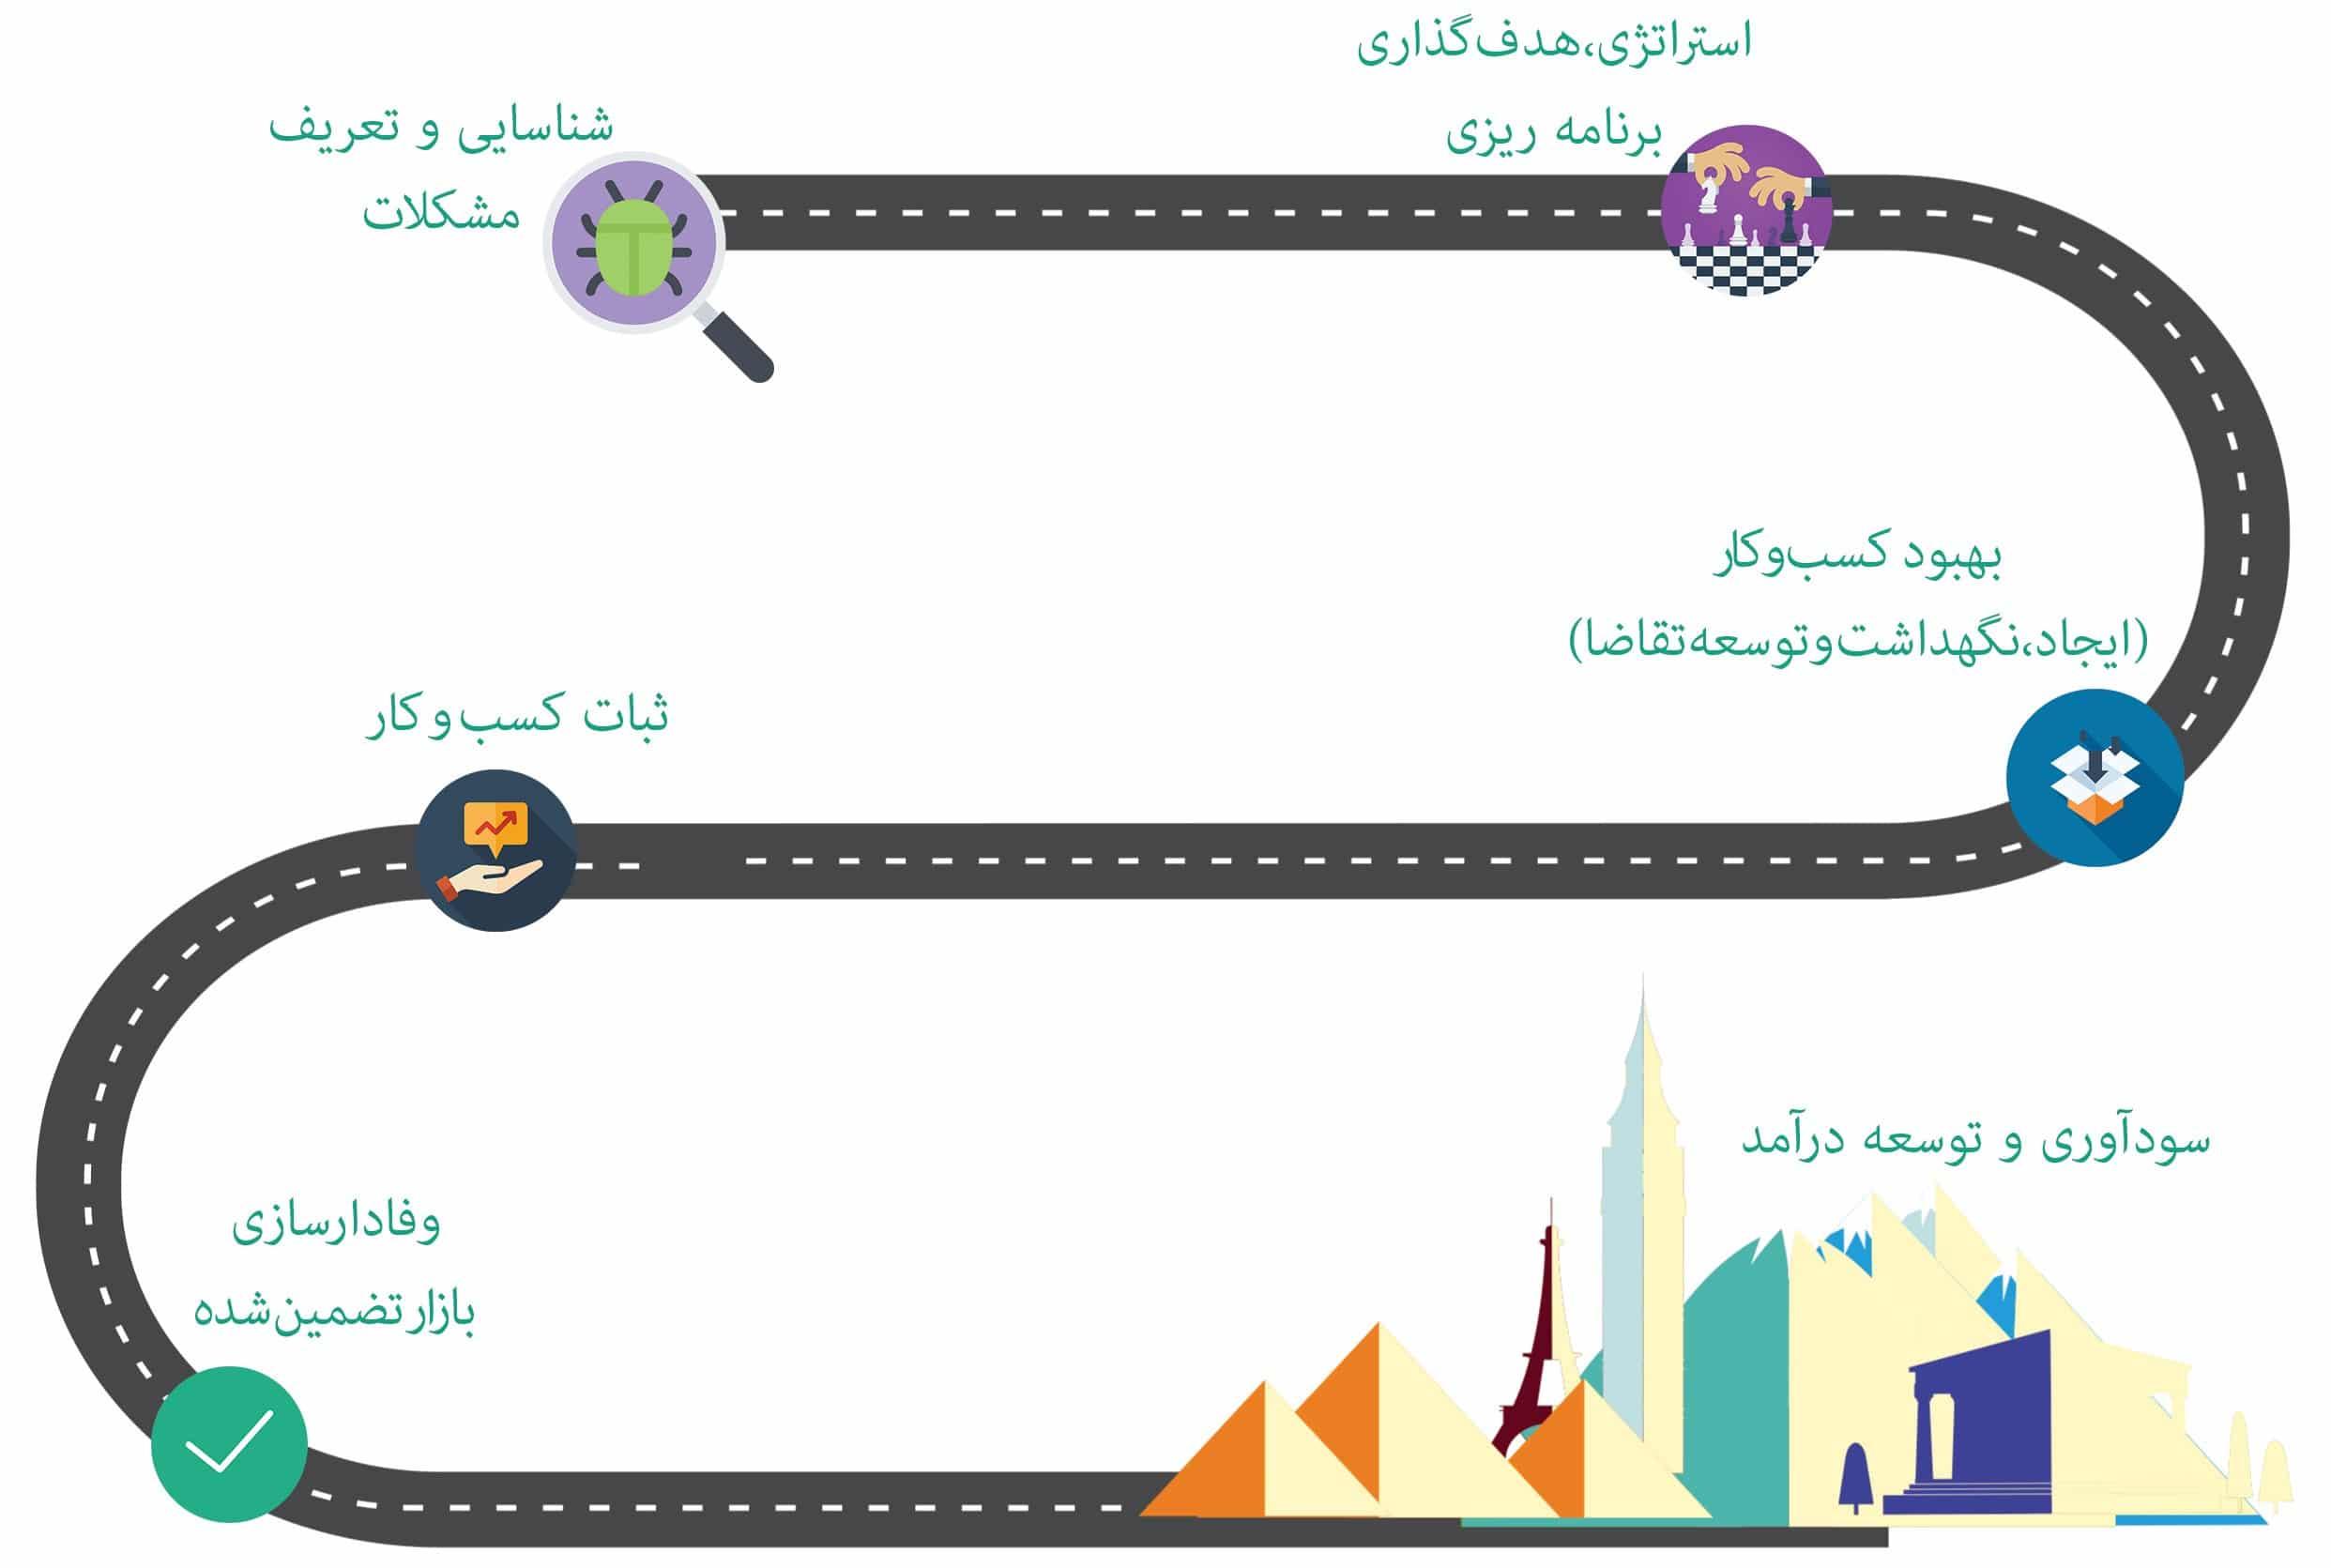 مراحل مشاوره مدیریت کسب و کار - مشاوره مدیریت - مشاوره مدیریتی - بهبود کسب و کار - توسعه کسب و کار - کسب و کار